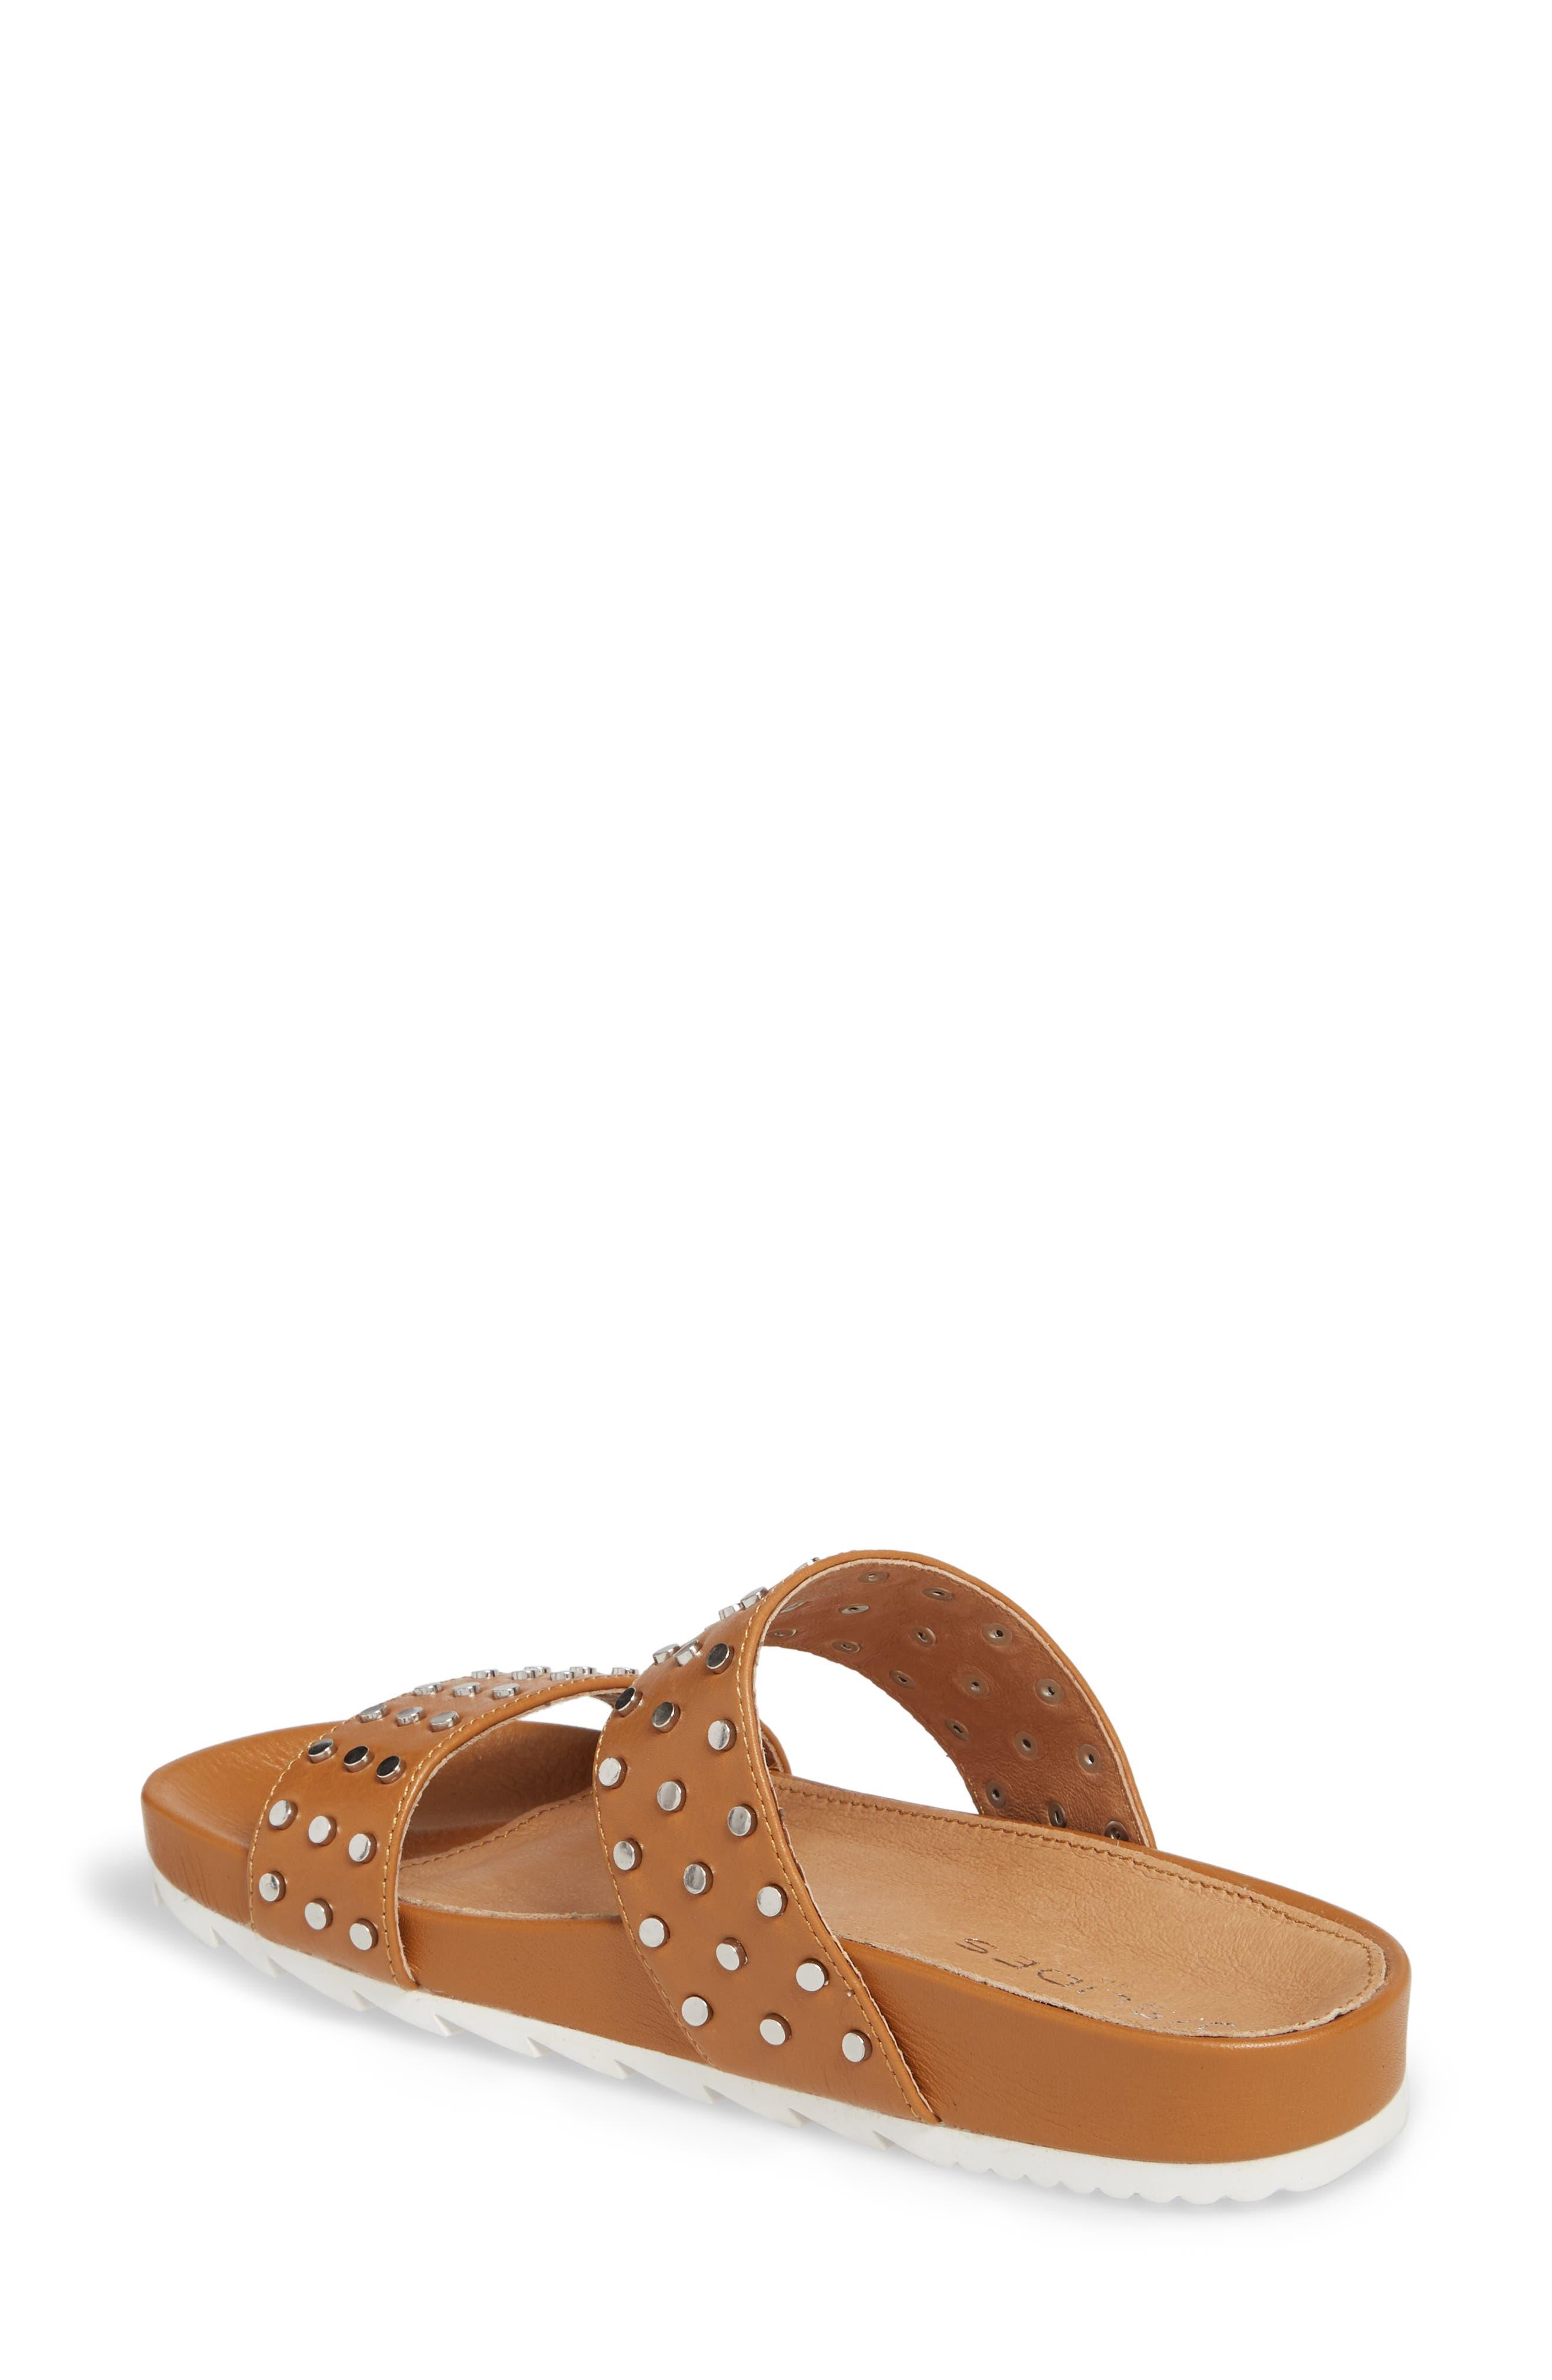 Erika Studded Slide Sandal,                             Alternate thumbnail 2, color,                             Tan Leather